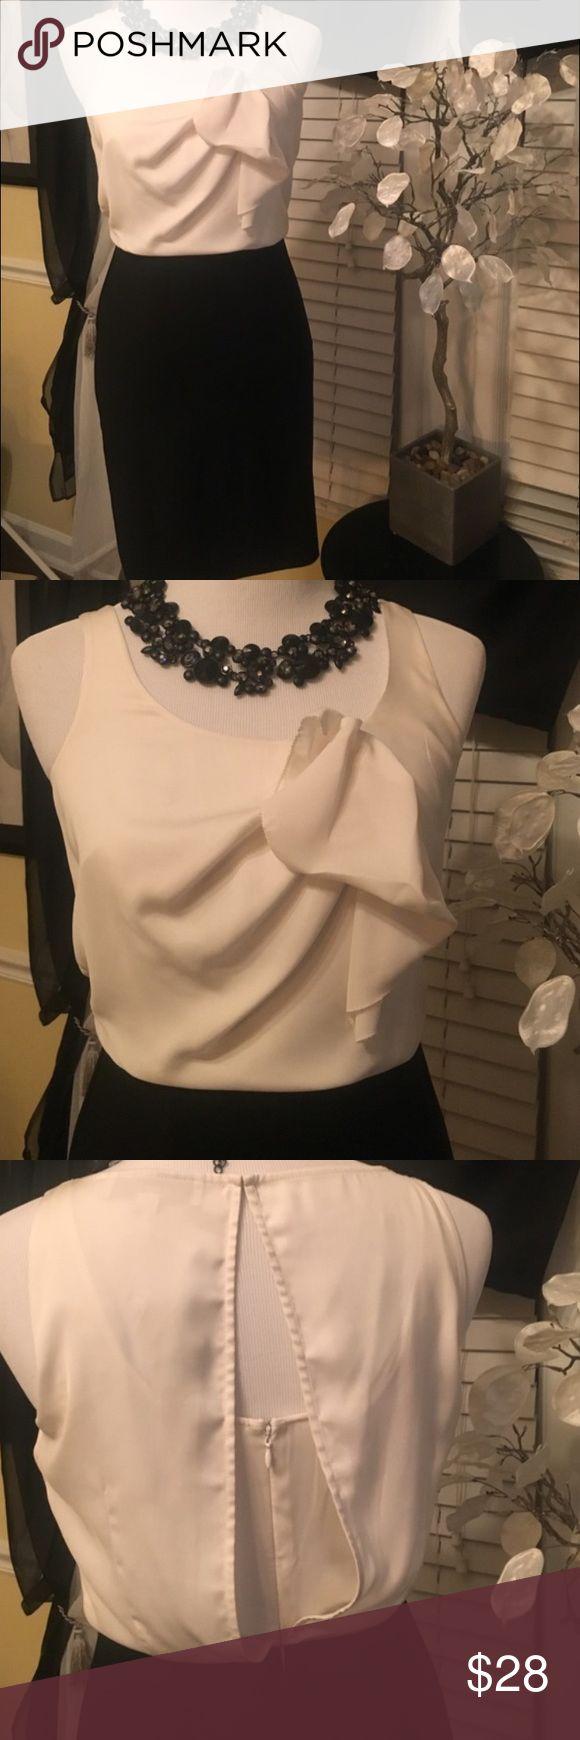 LOFT black and white sleeveless dress Ann Taylor LOFT sleeveless dress. Petite size 0P. Black and white. LOFT Dresses